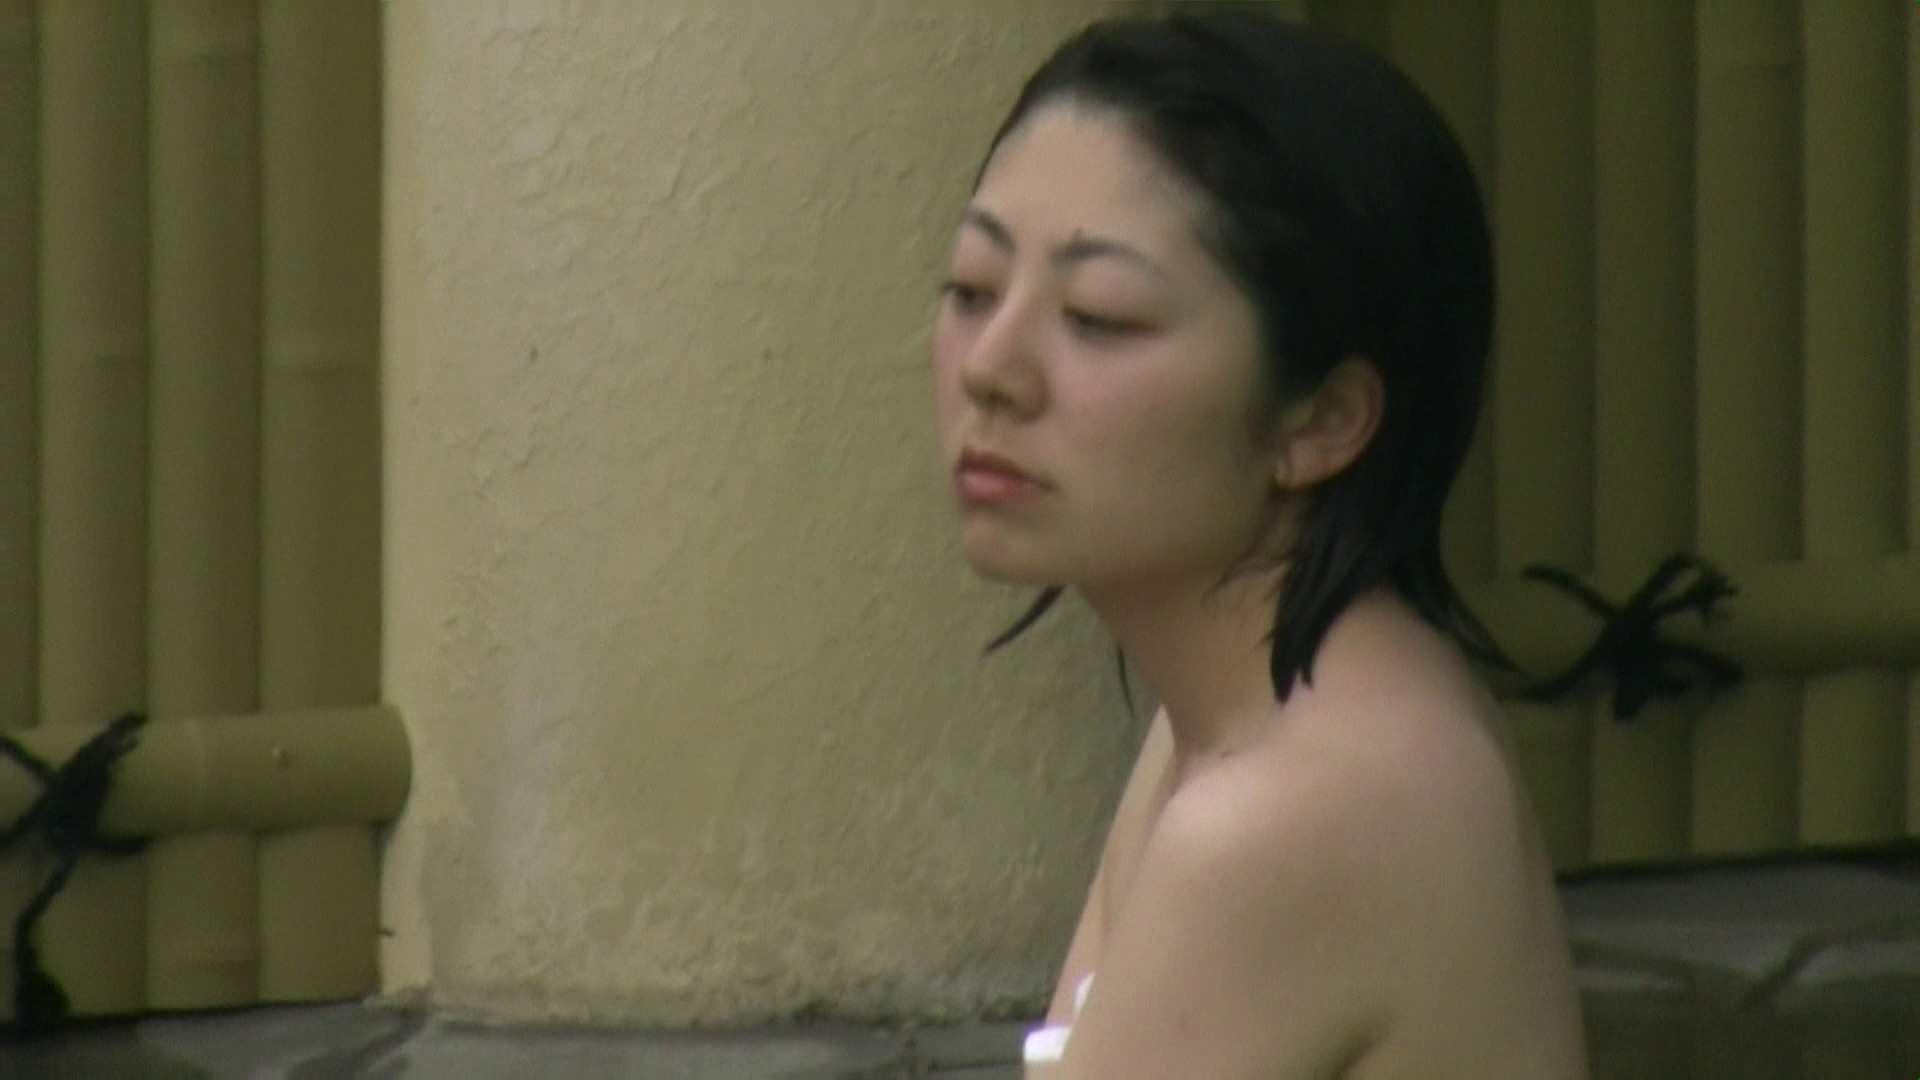 Aquaな露天風呂Vol.04 露天風呂編 | 盗撮シリーズ  94PIX 25